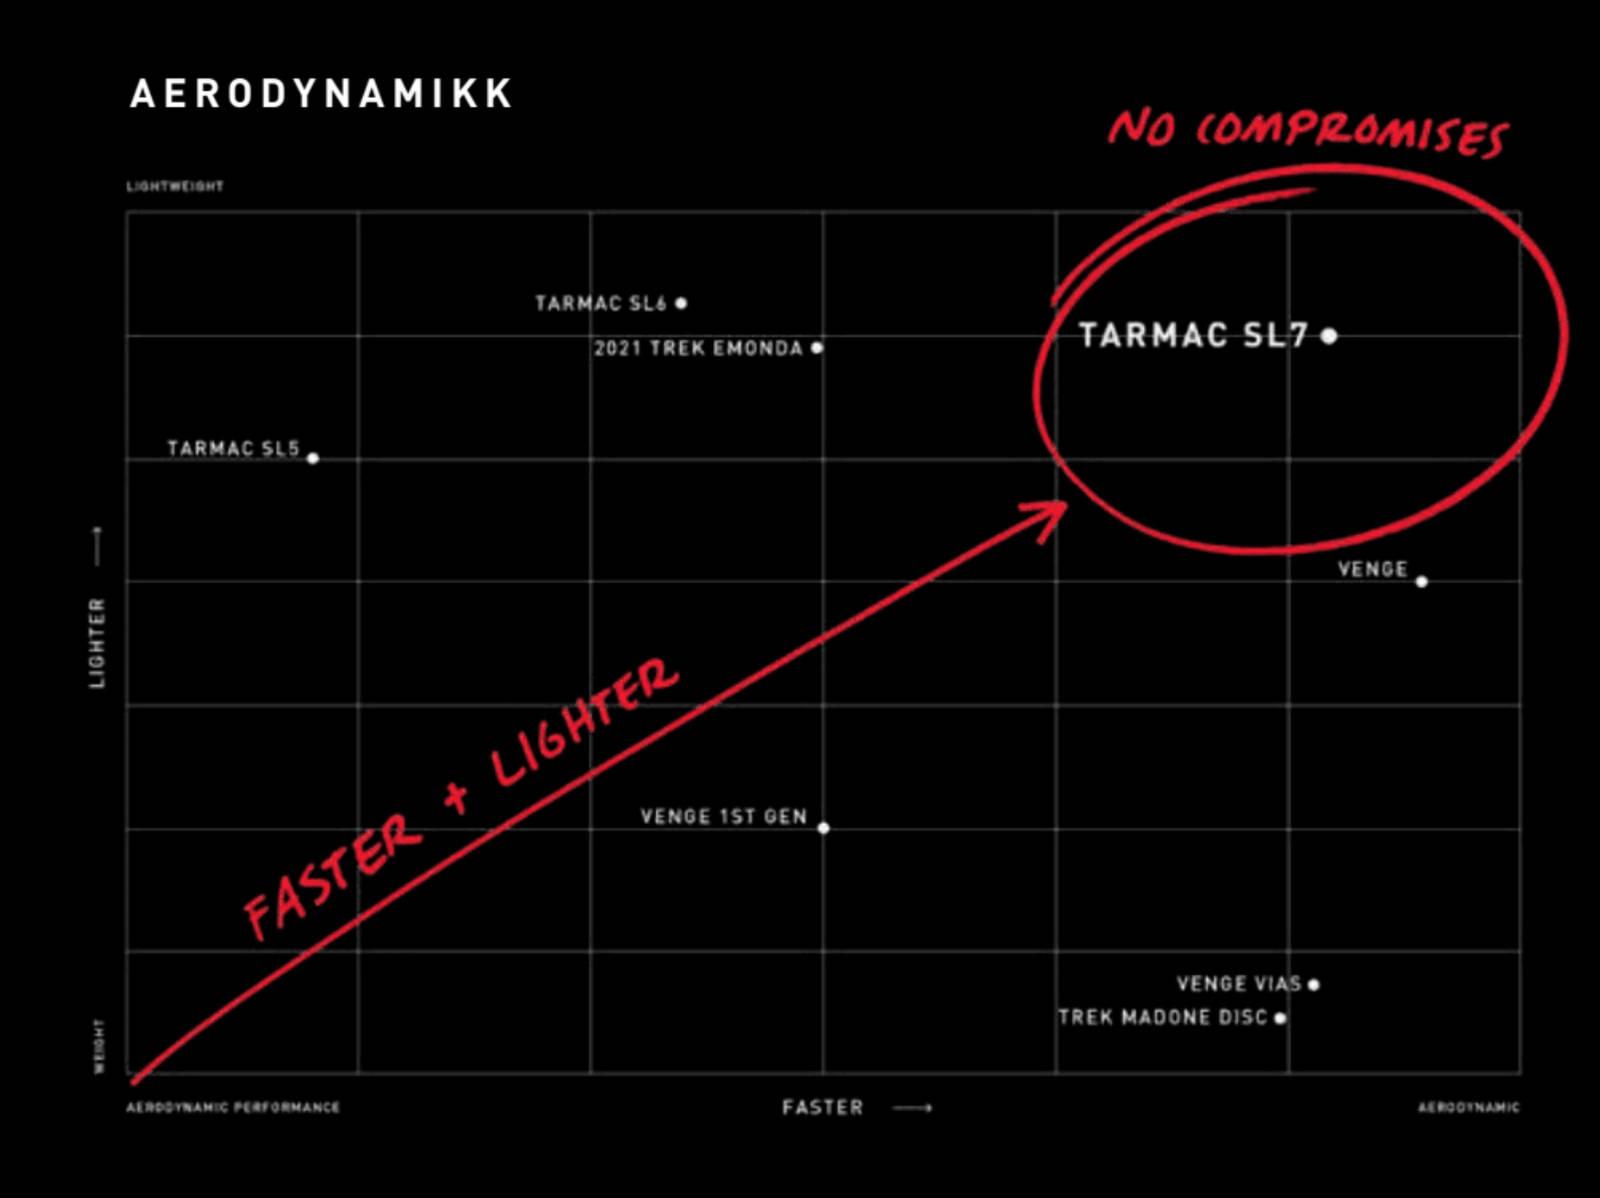 aero-tabell Tarmac SL7